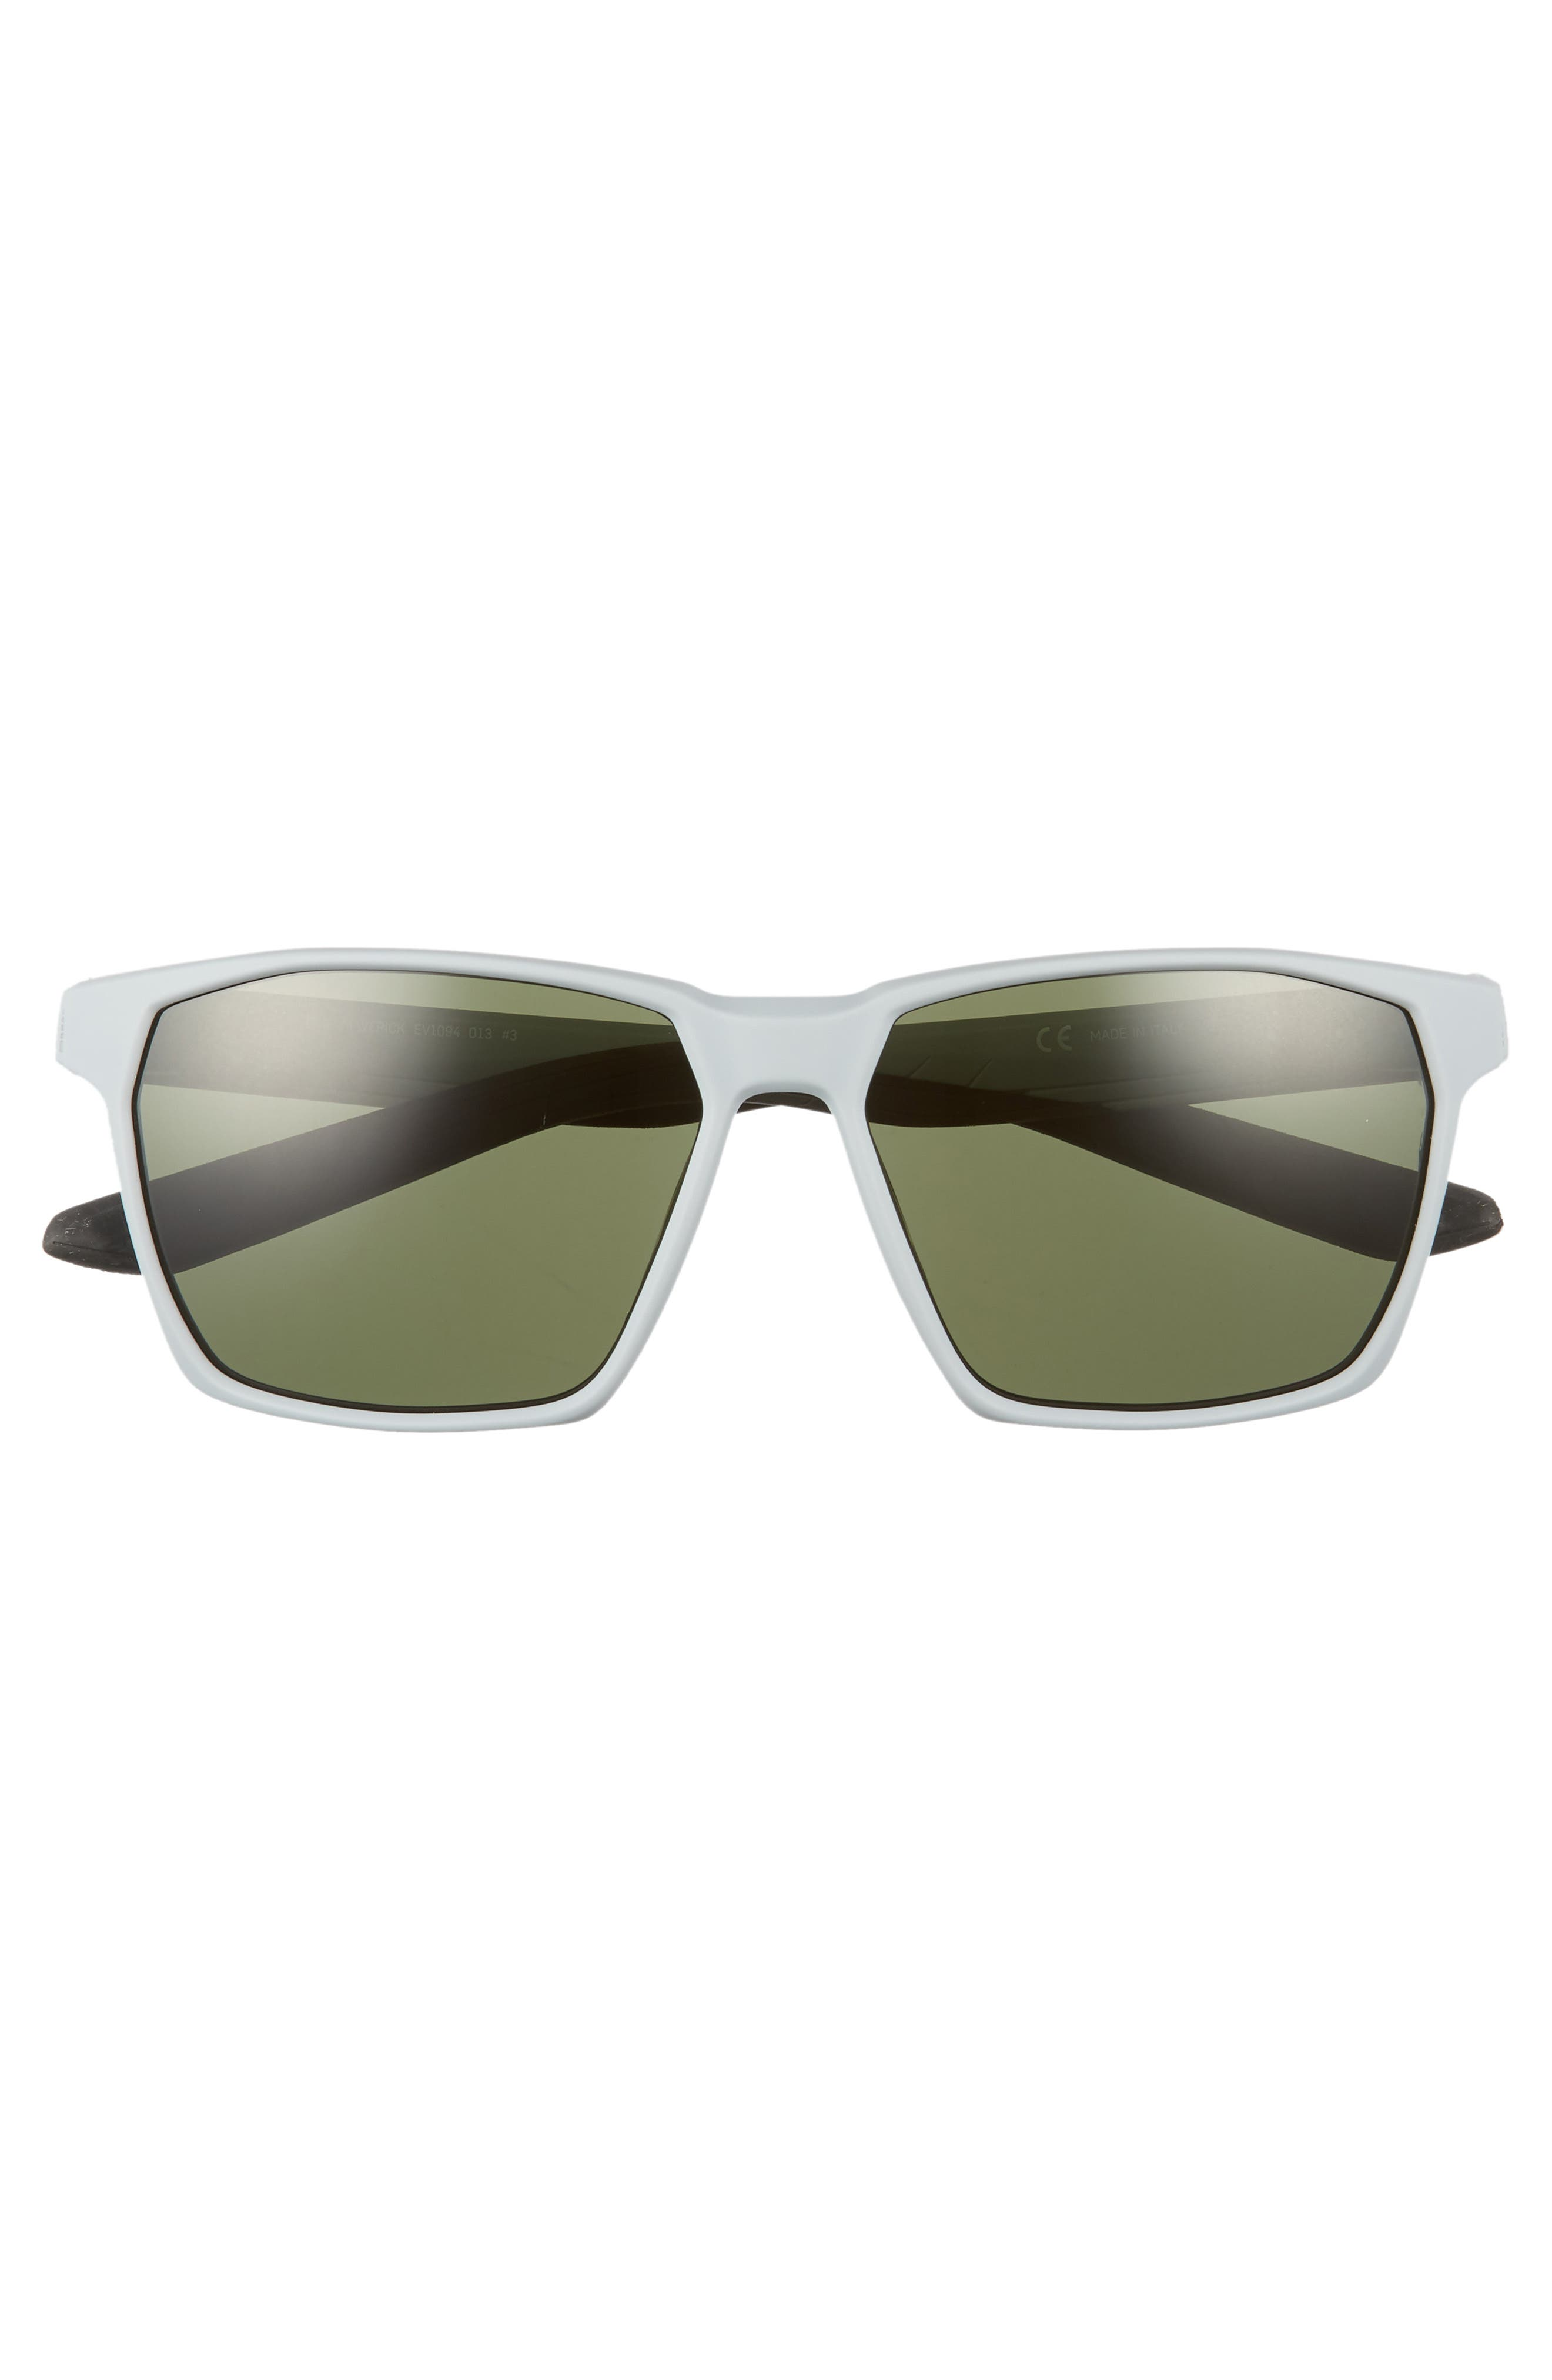 Maverick 59mm Sunglasses,                             Alternate thumbnail 2, color,                             Matte Wolf Grey/ Green